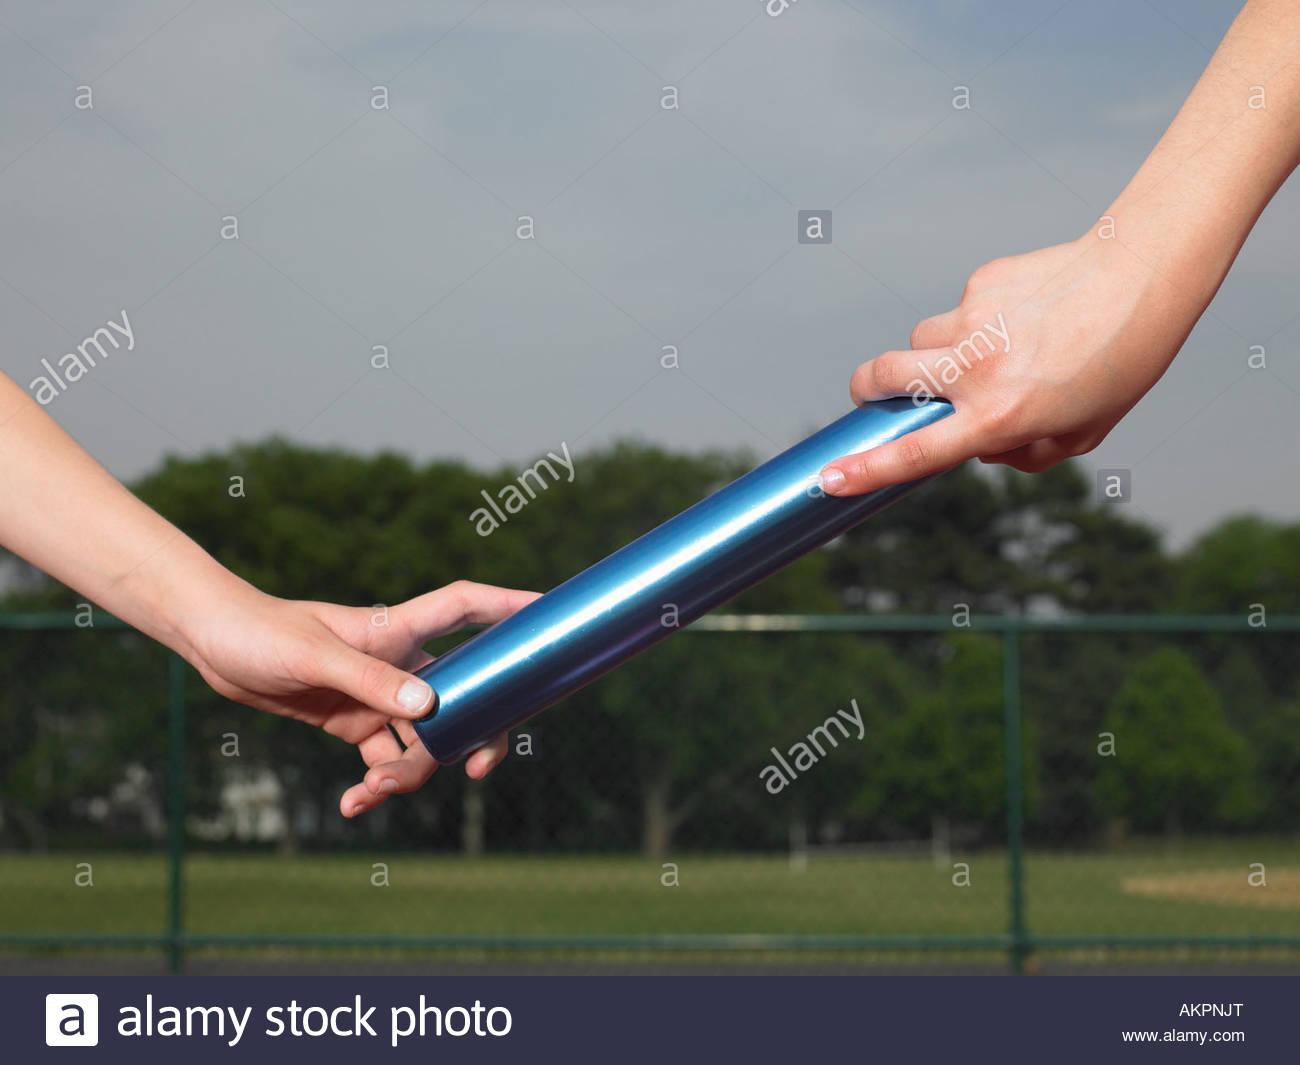 A person passing a baton - Stock Image